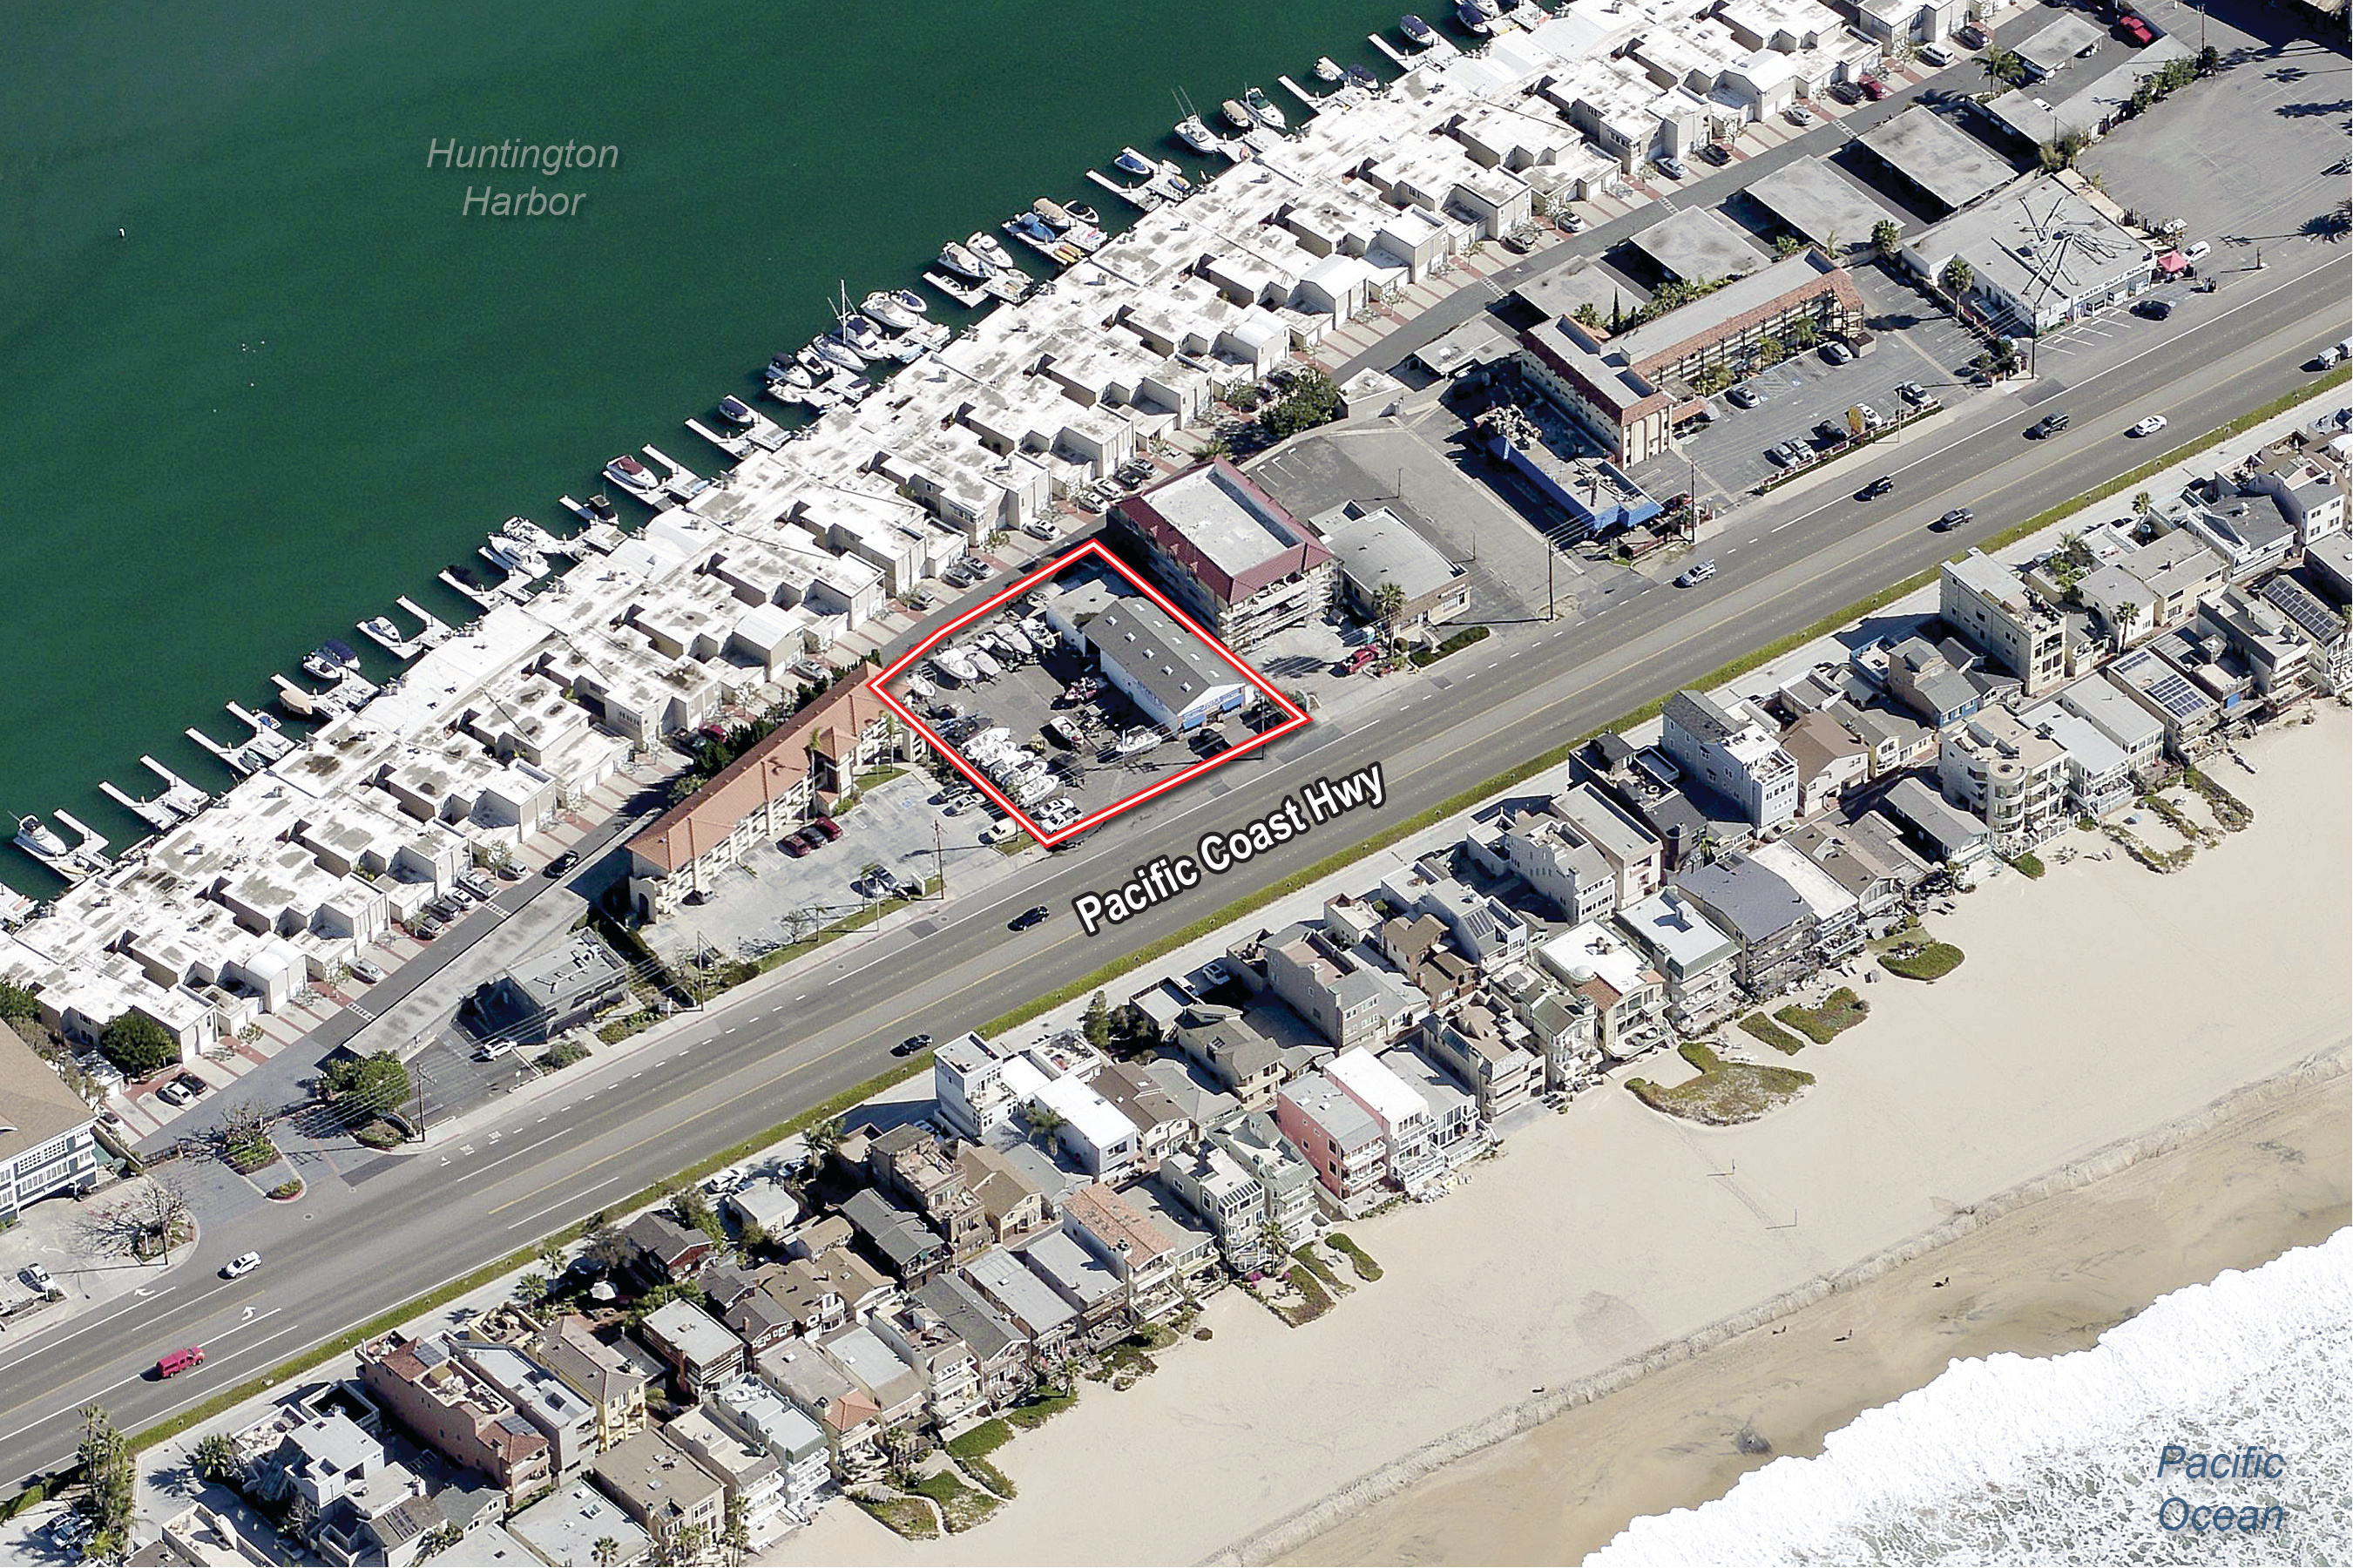 16214 Pacific Coast Highway Aerial